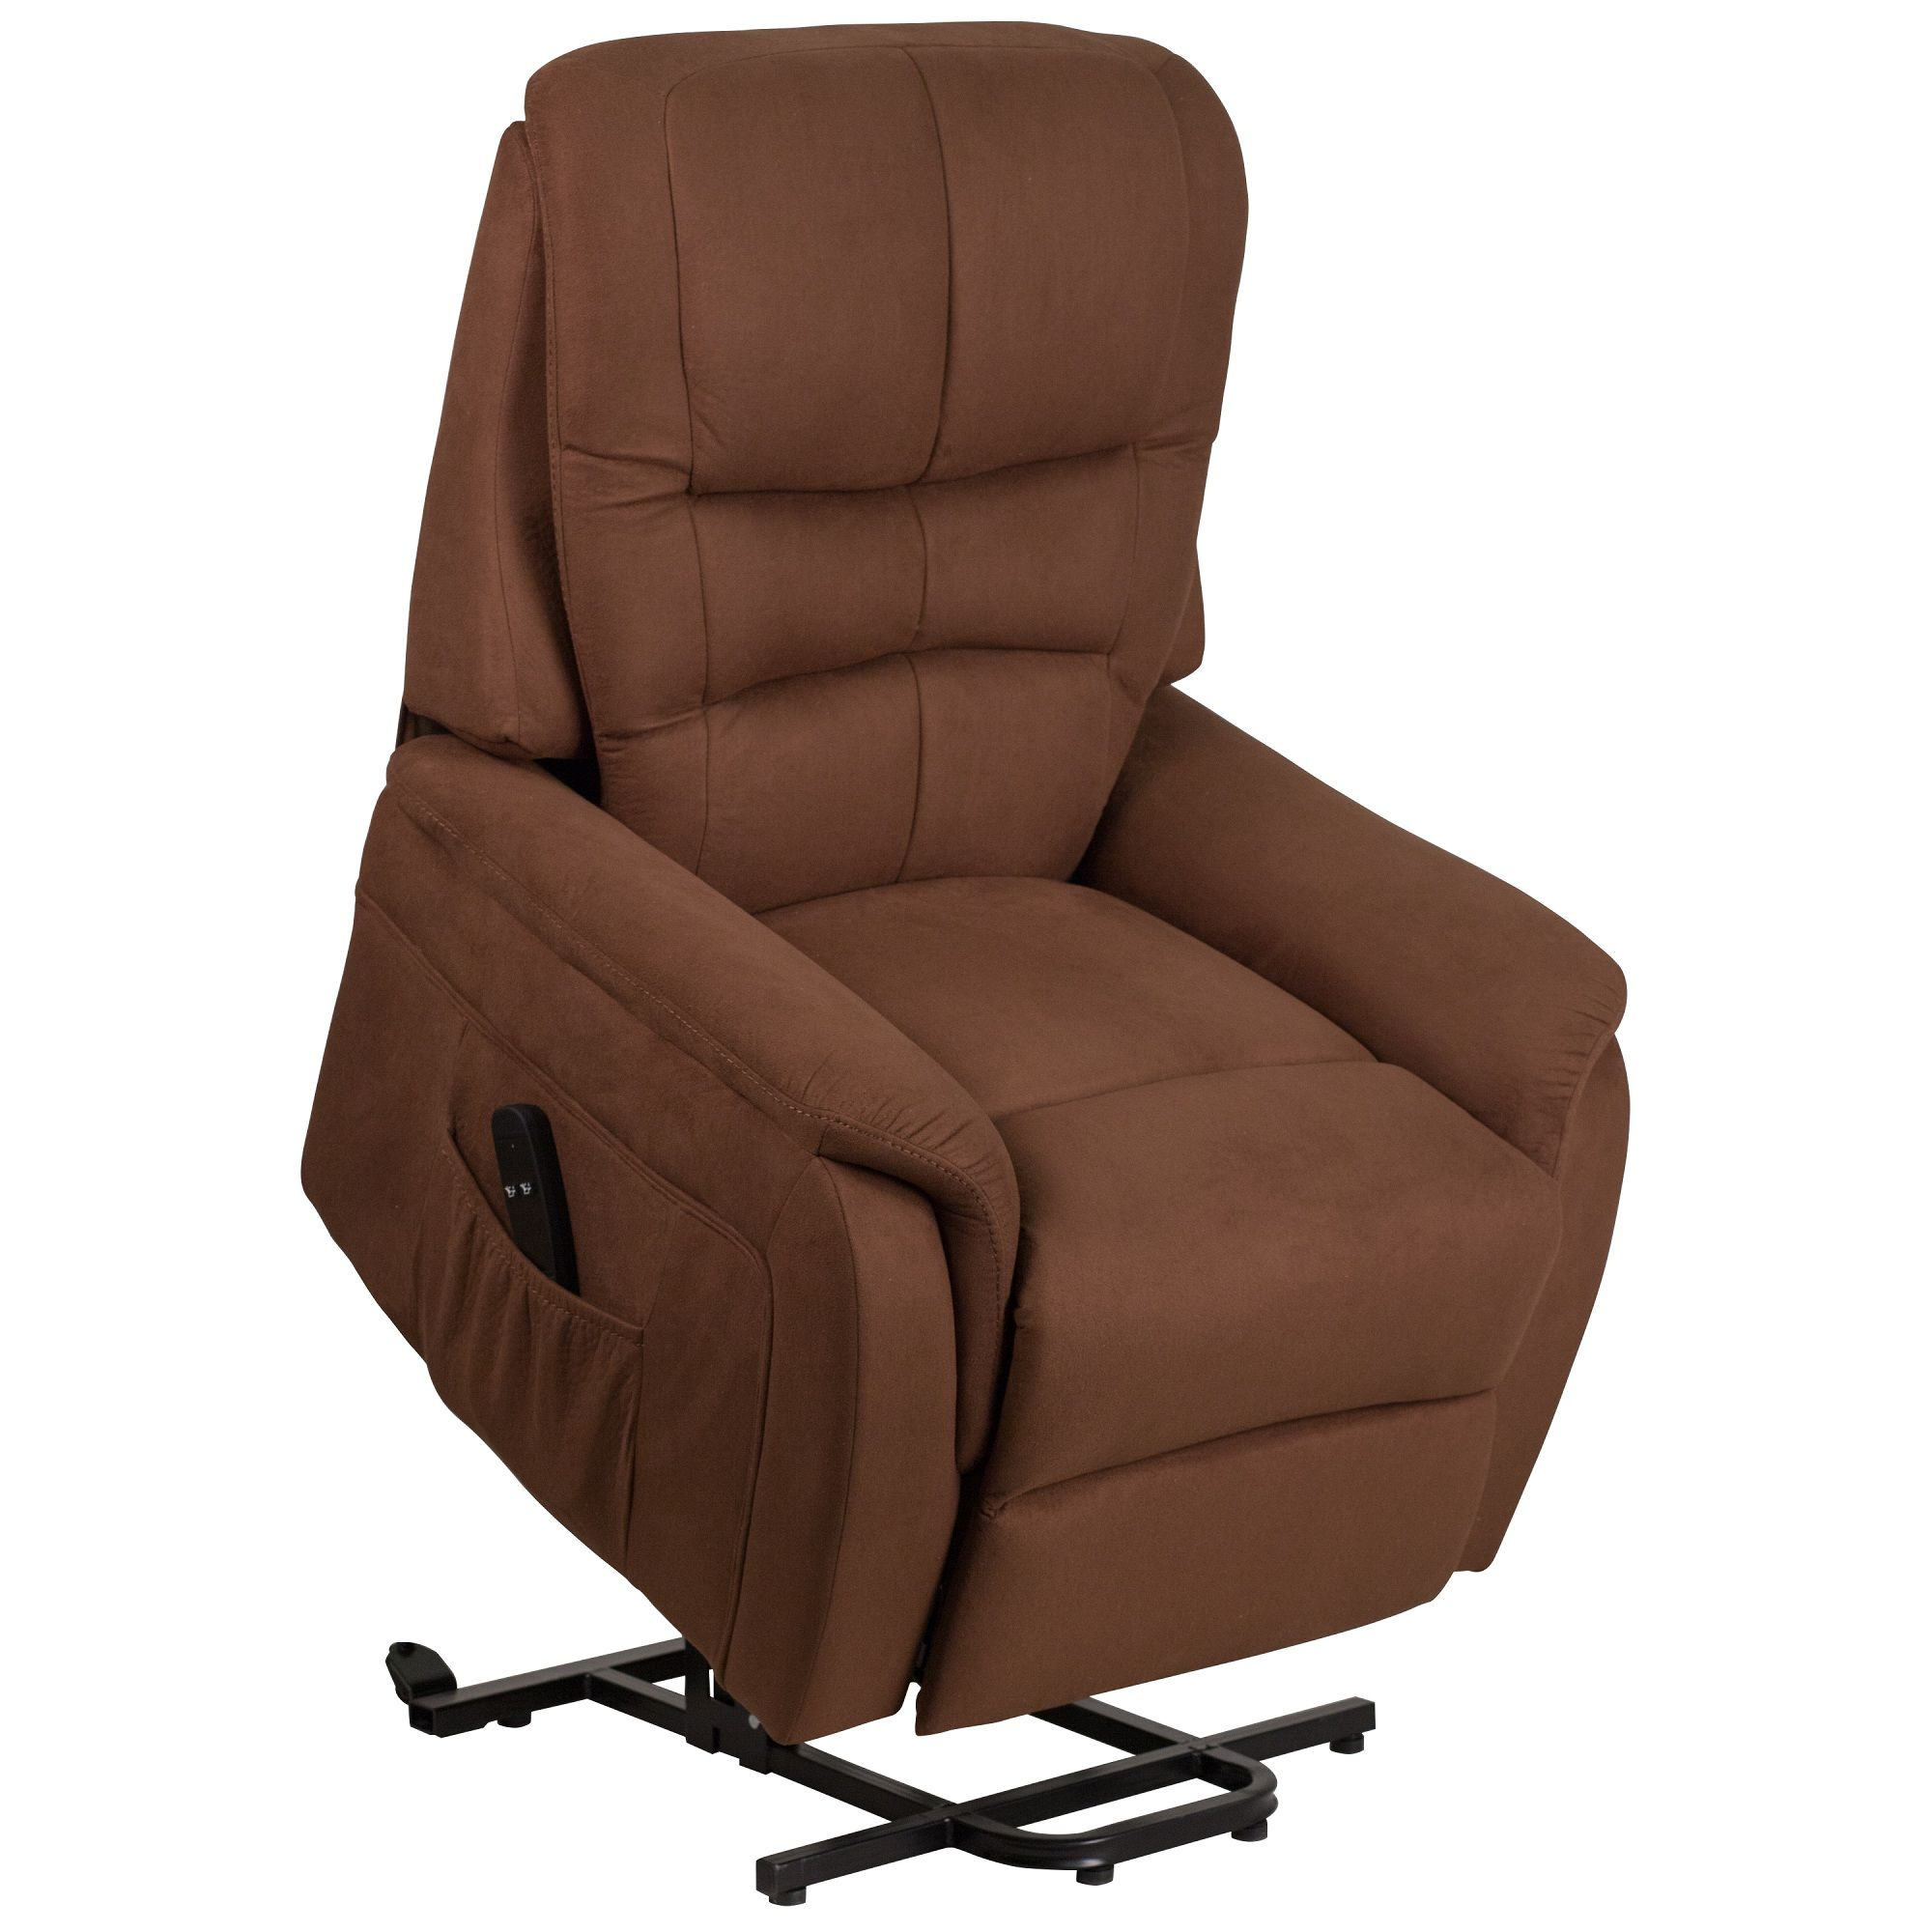 microfiber power recliner chair